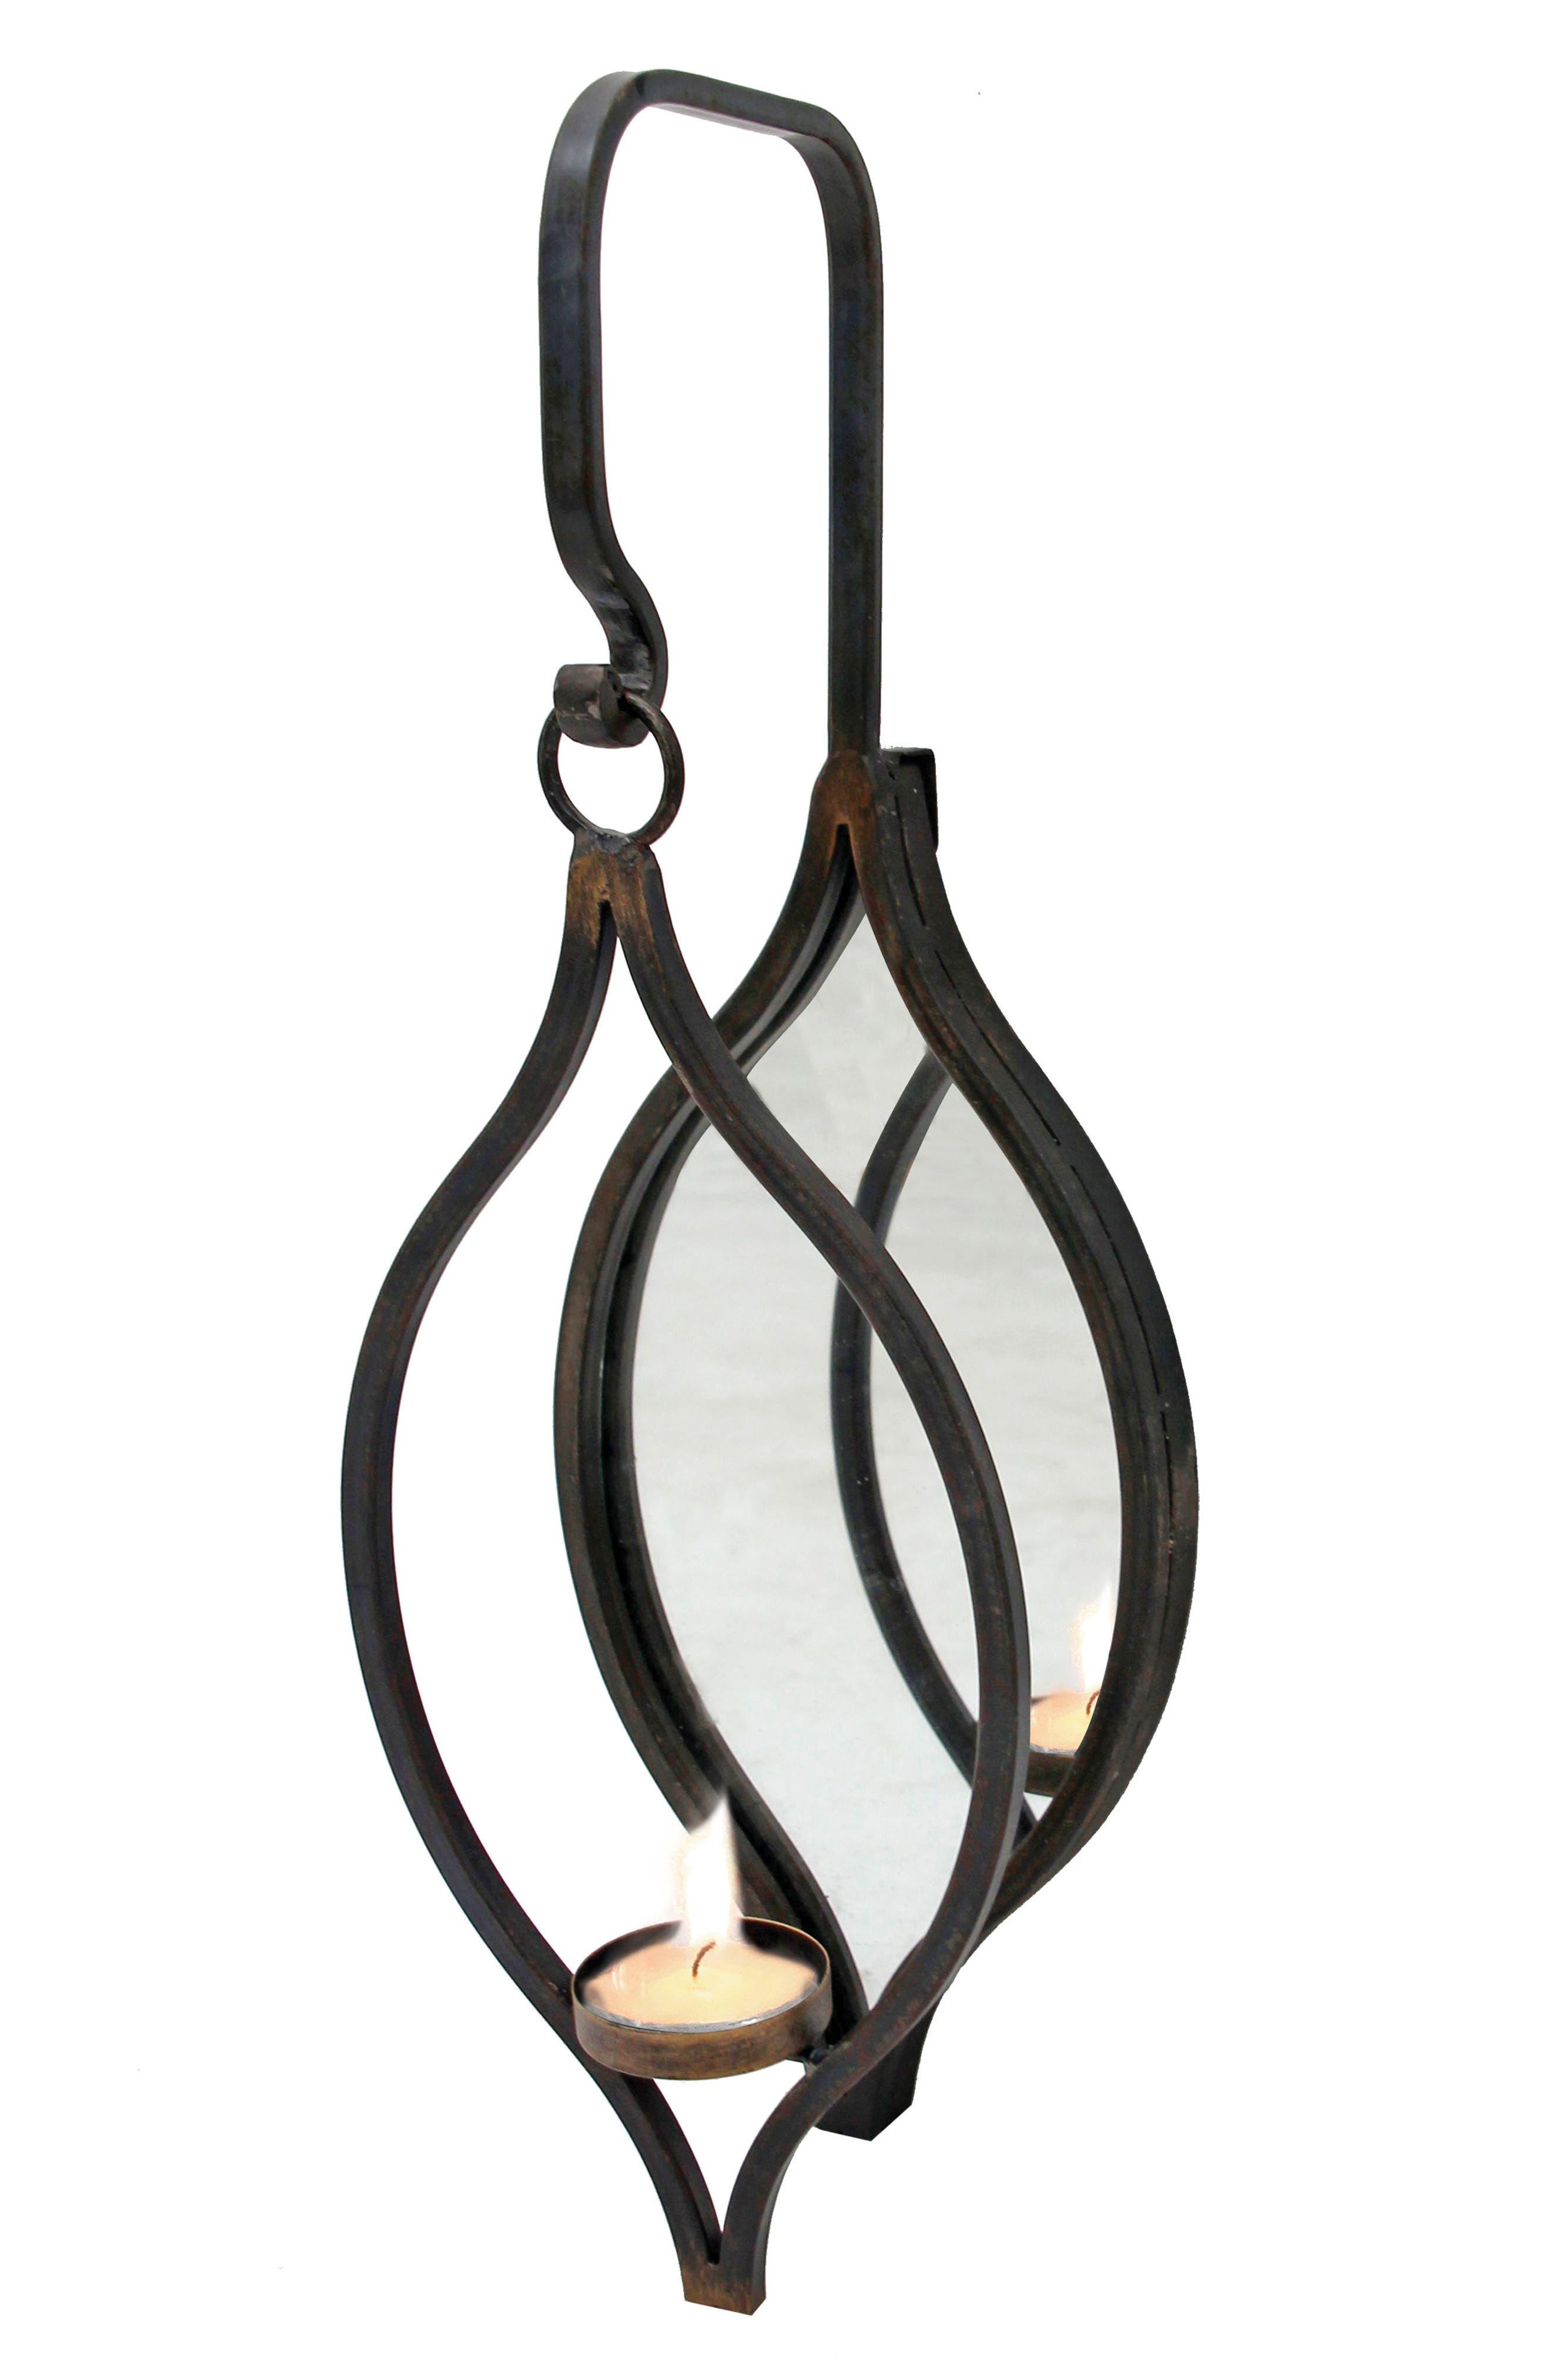 Main Image - Foreside Hanging Tea Light Holder